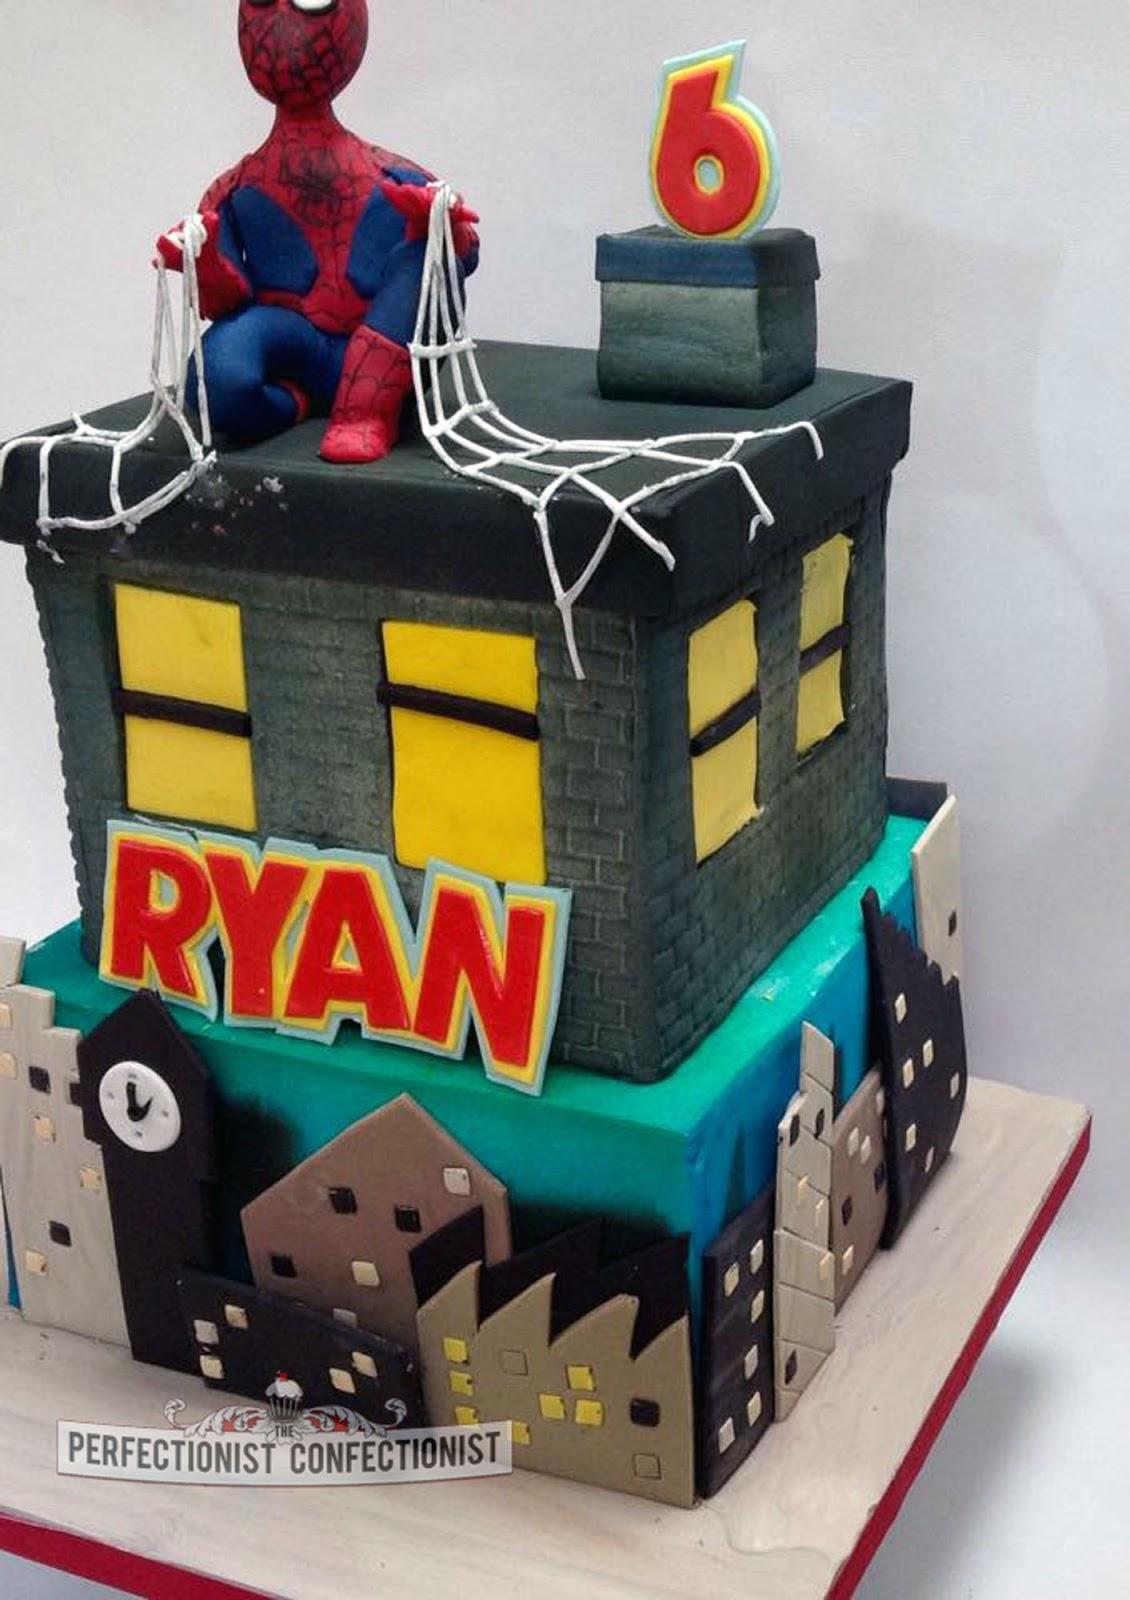 The Perfectionist Confectionist Ryan Spiderman Birthday Cake